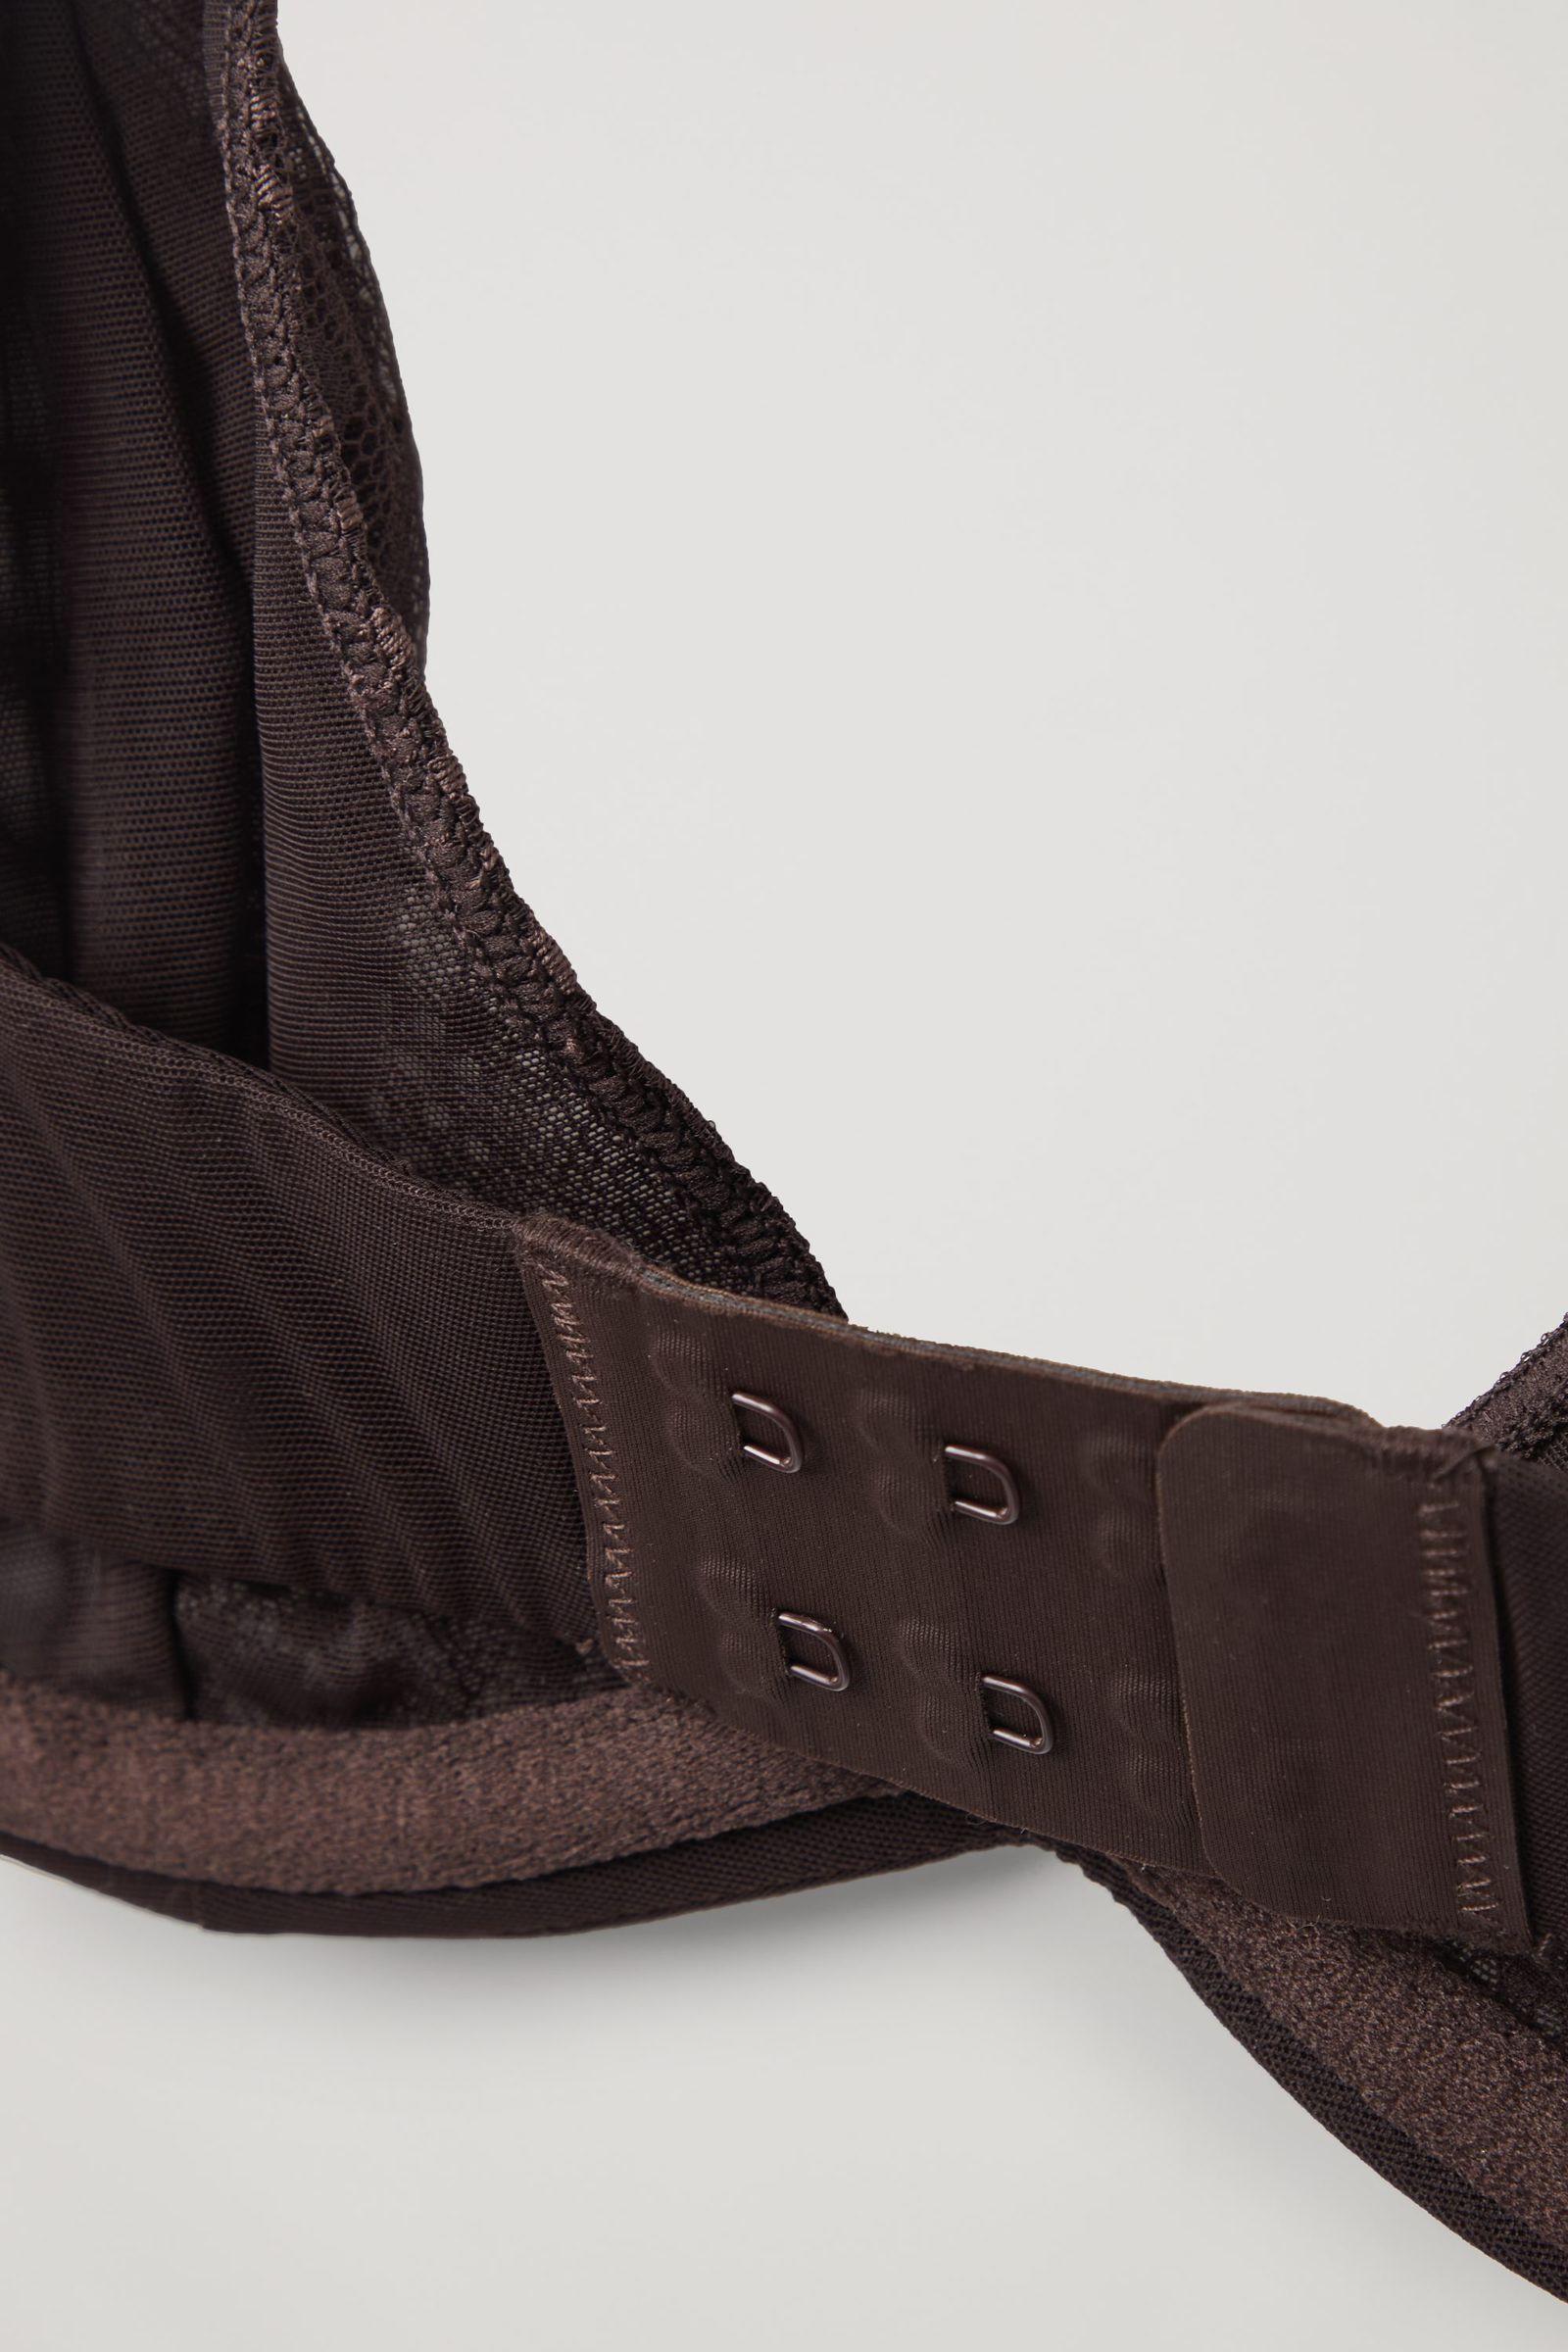 COS 레이스 브라의 브라운컬러 Detail입니다.